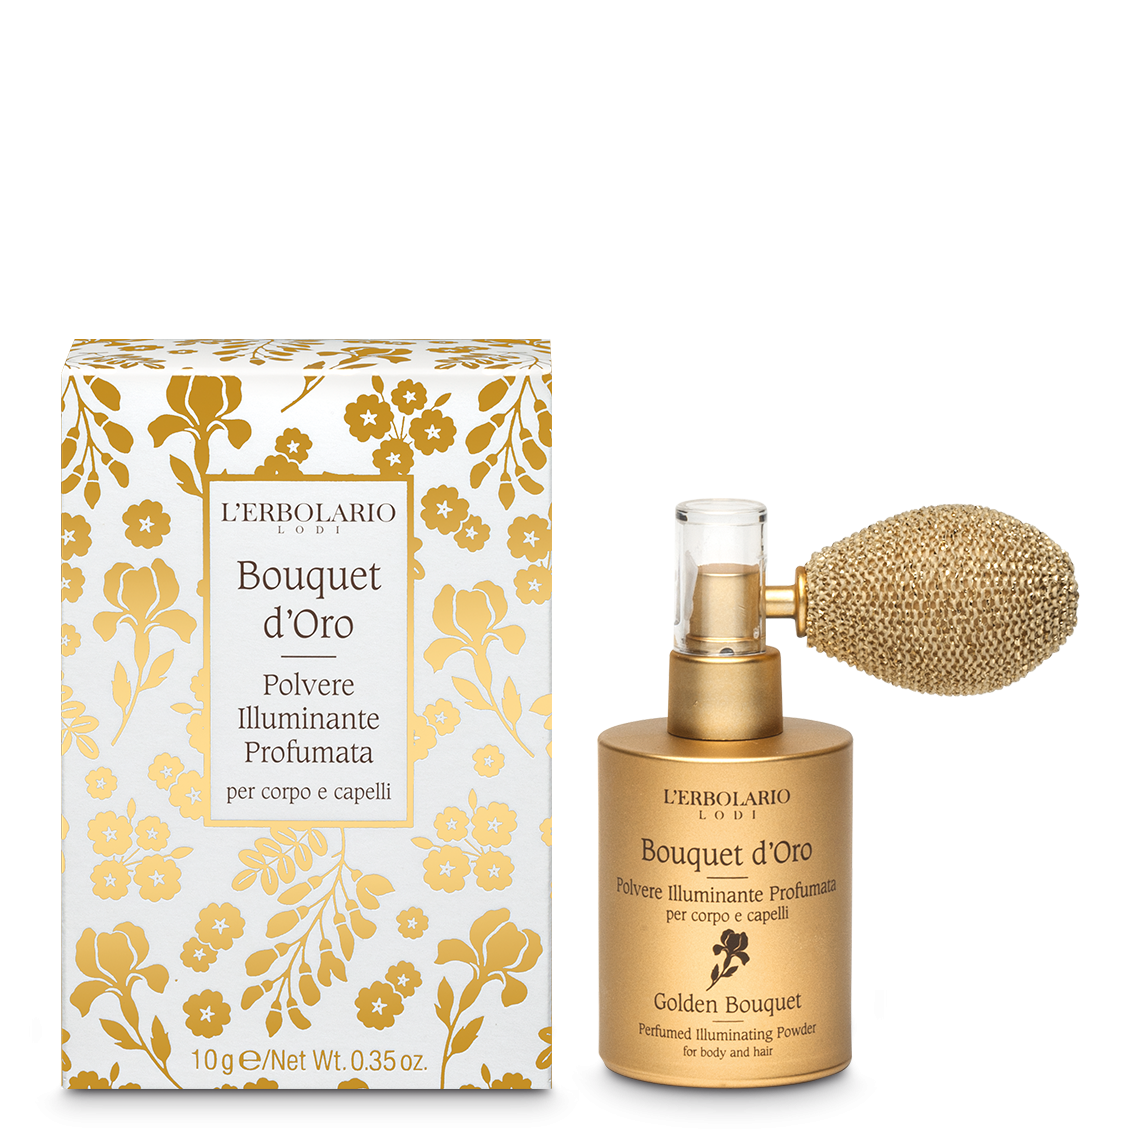 Polvere Illuminante Profumata Bouquet d'Oro